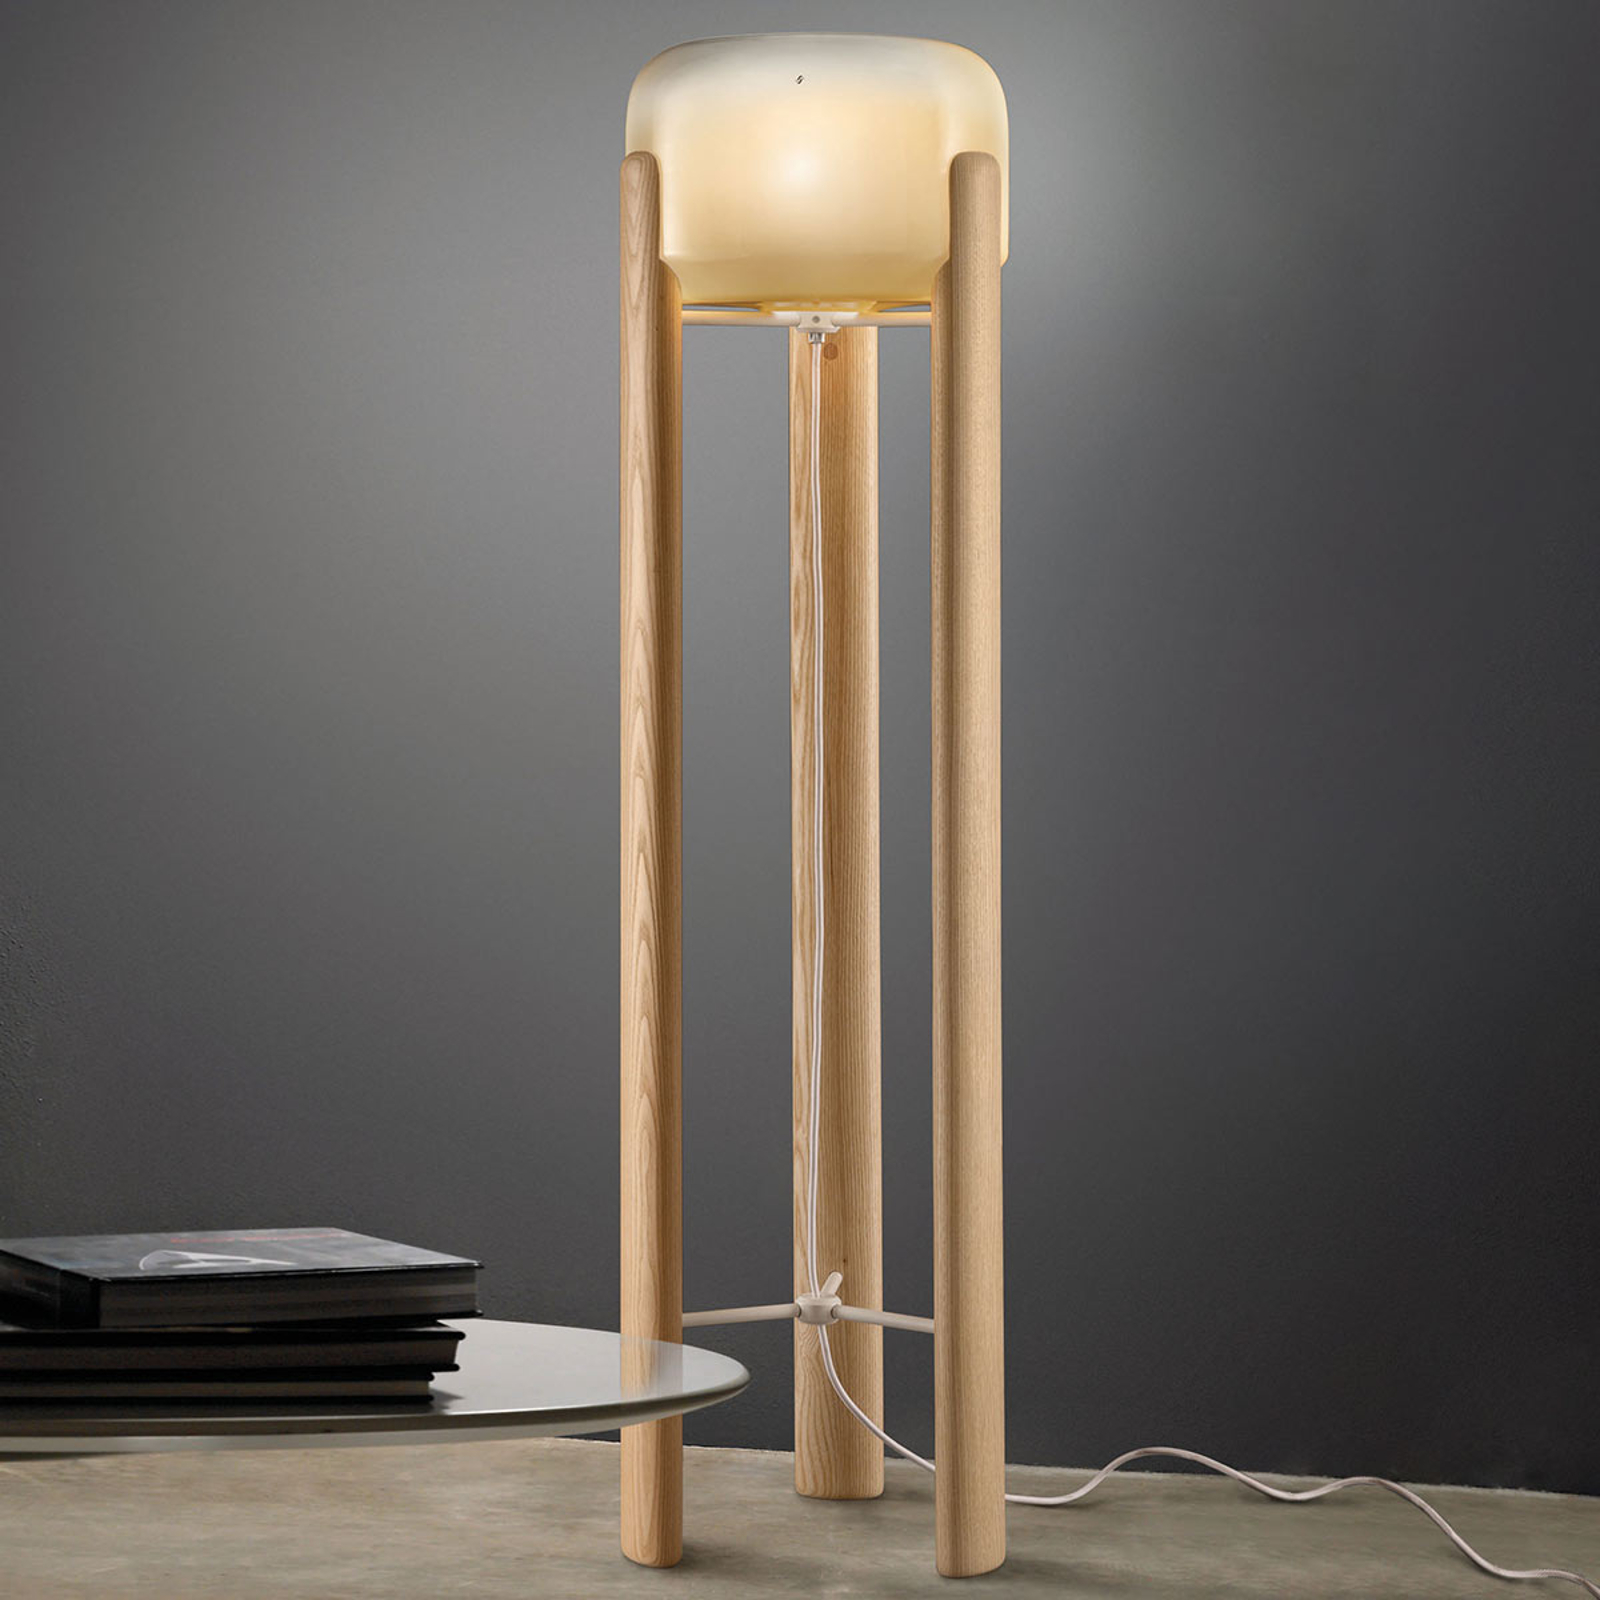 Vloerlamp Sata kap in amber, voet hout licht